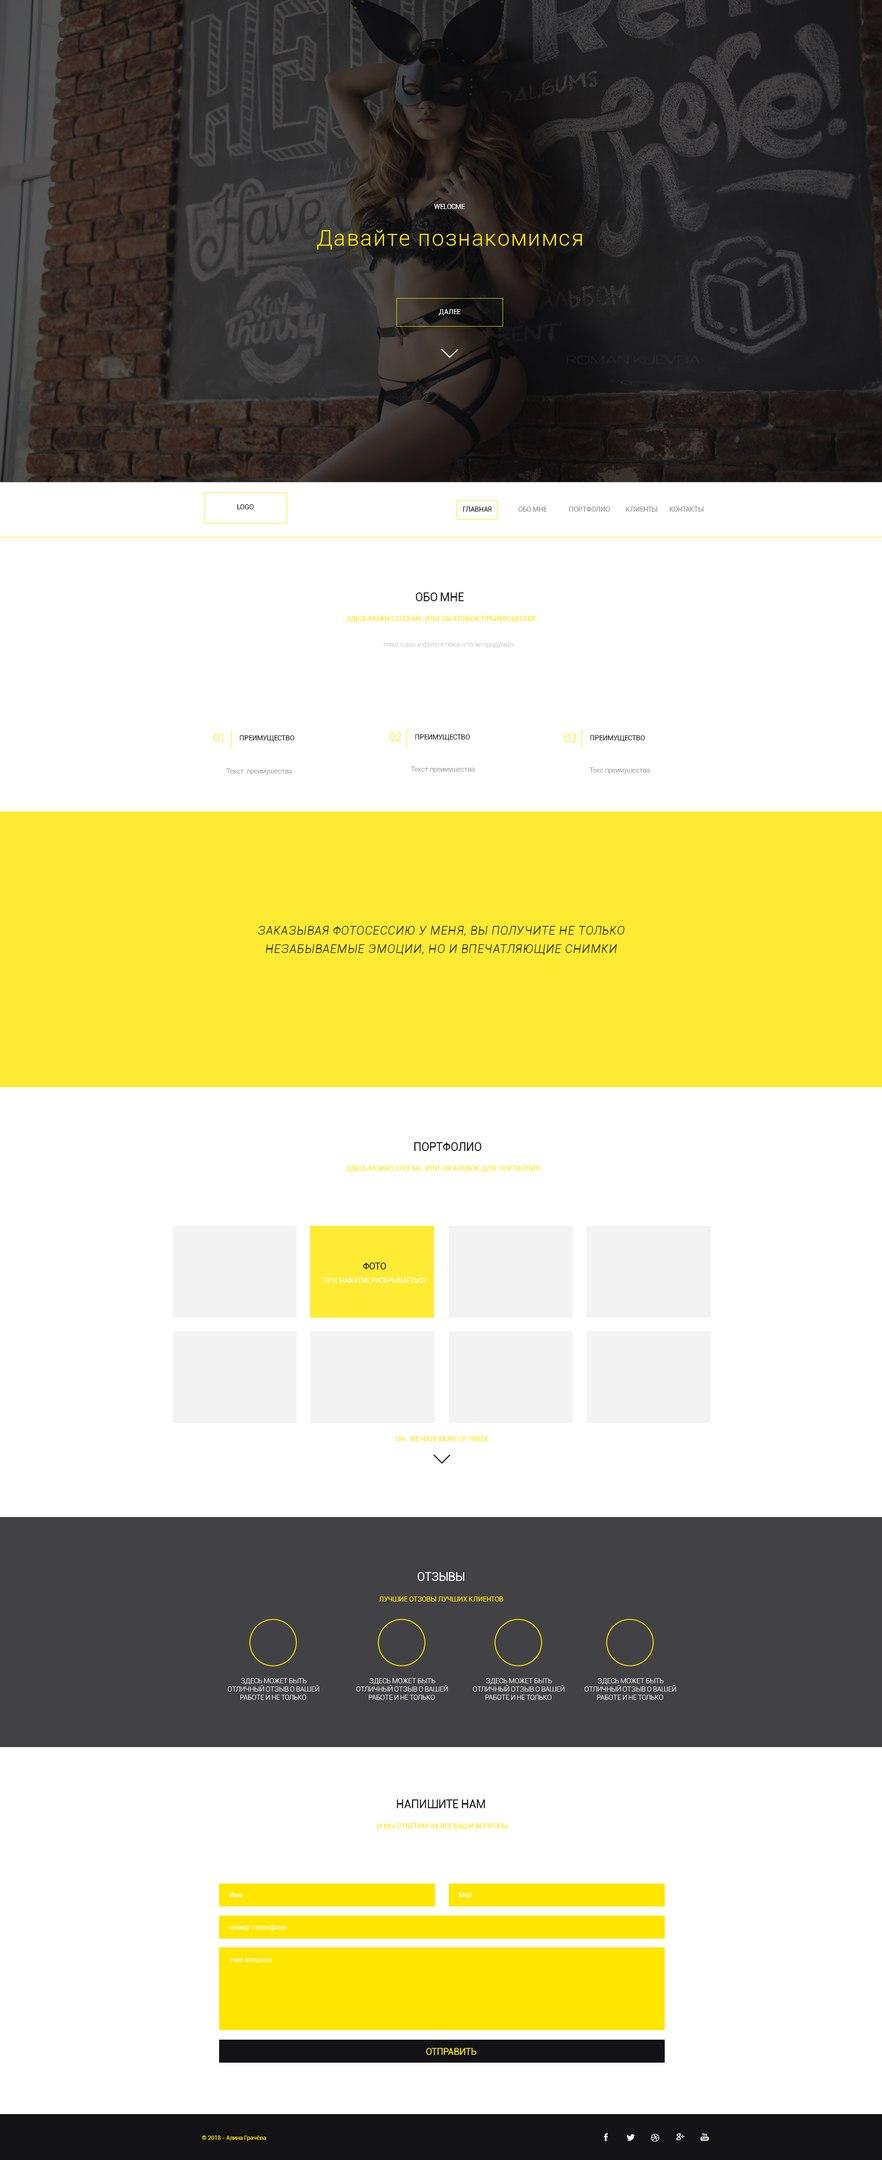 Концепция Landing Page